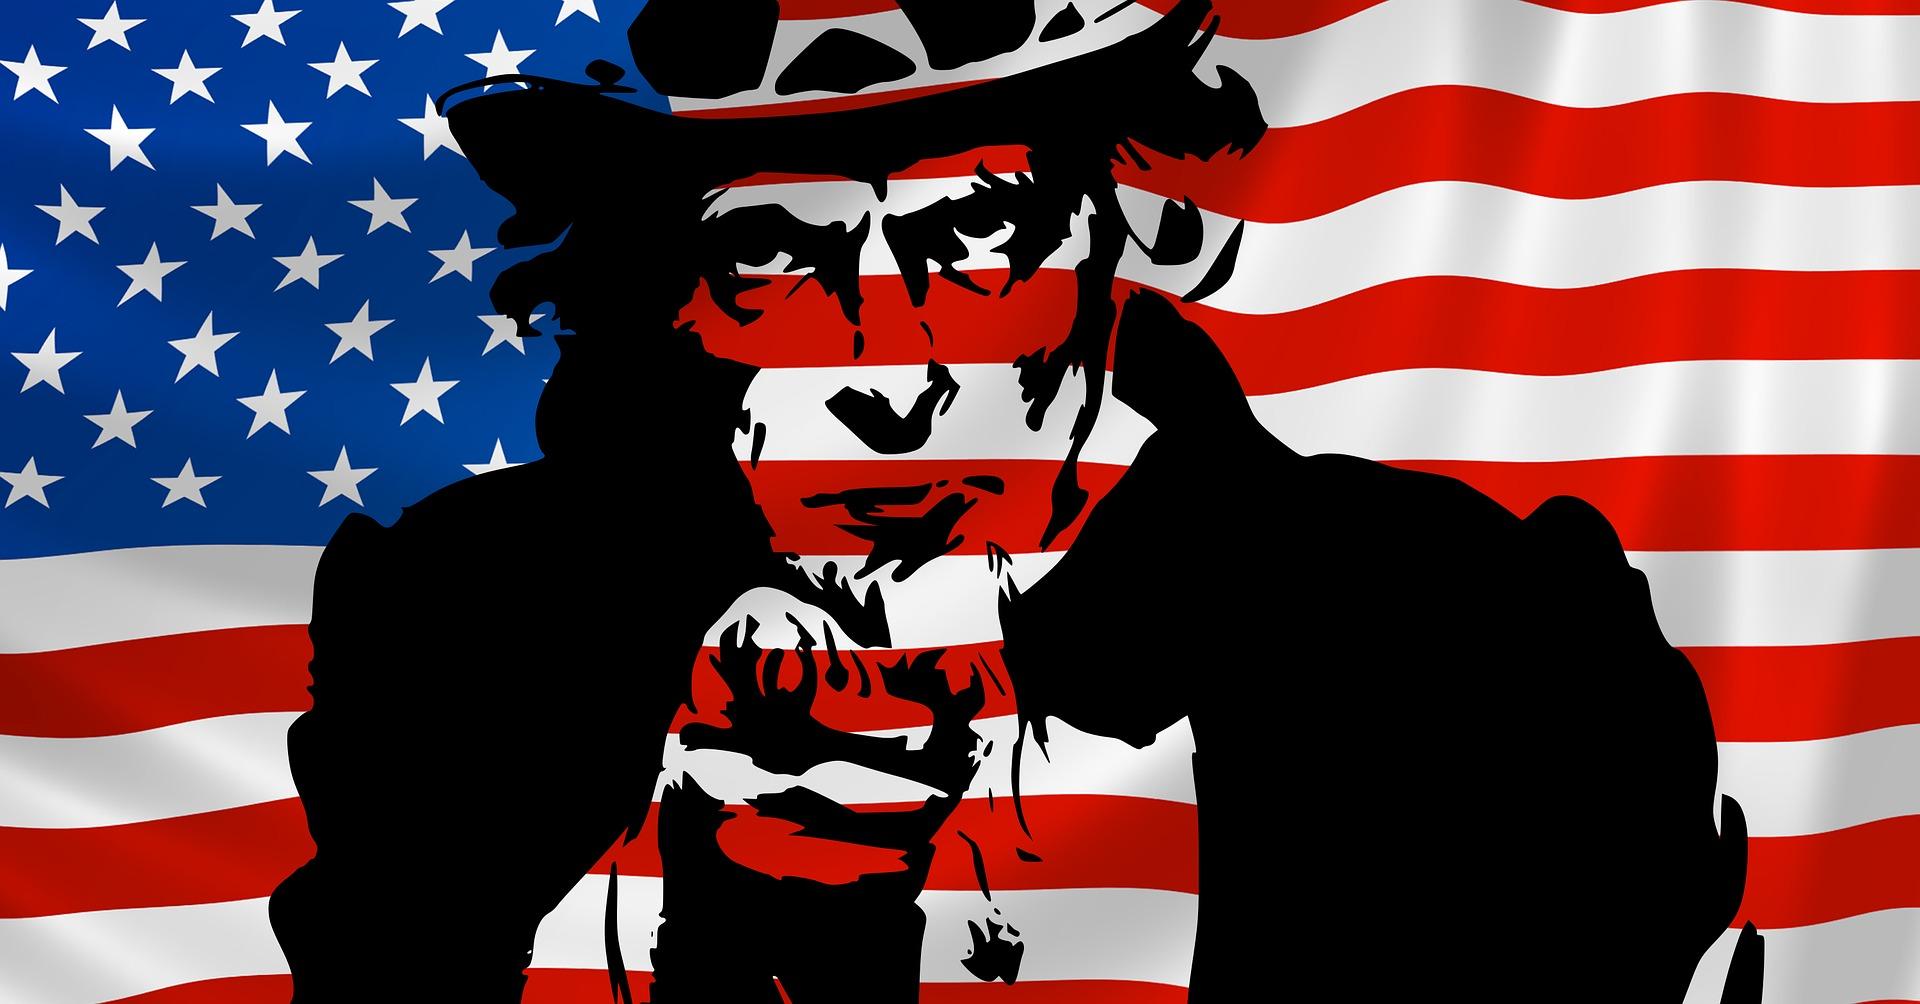 uncle sam outline over american flag background